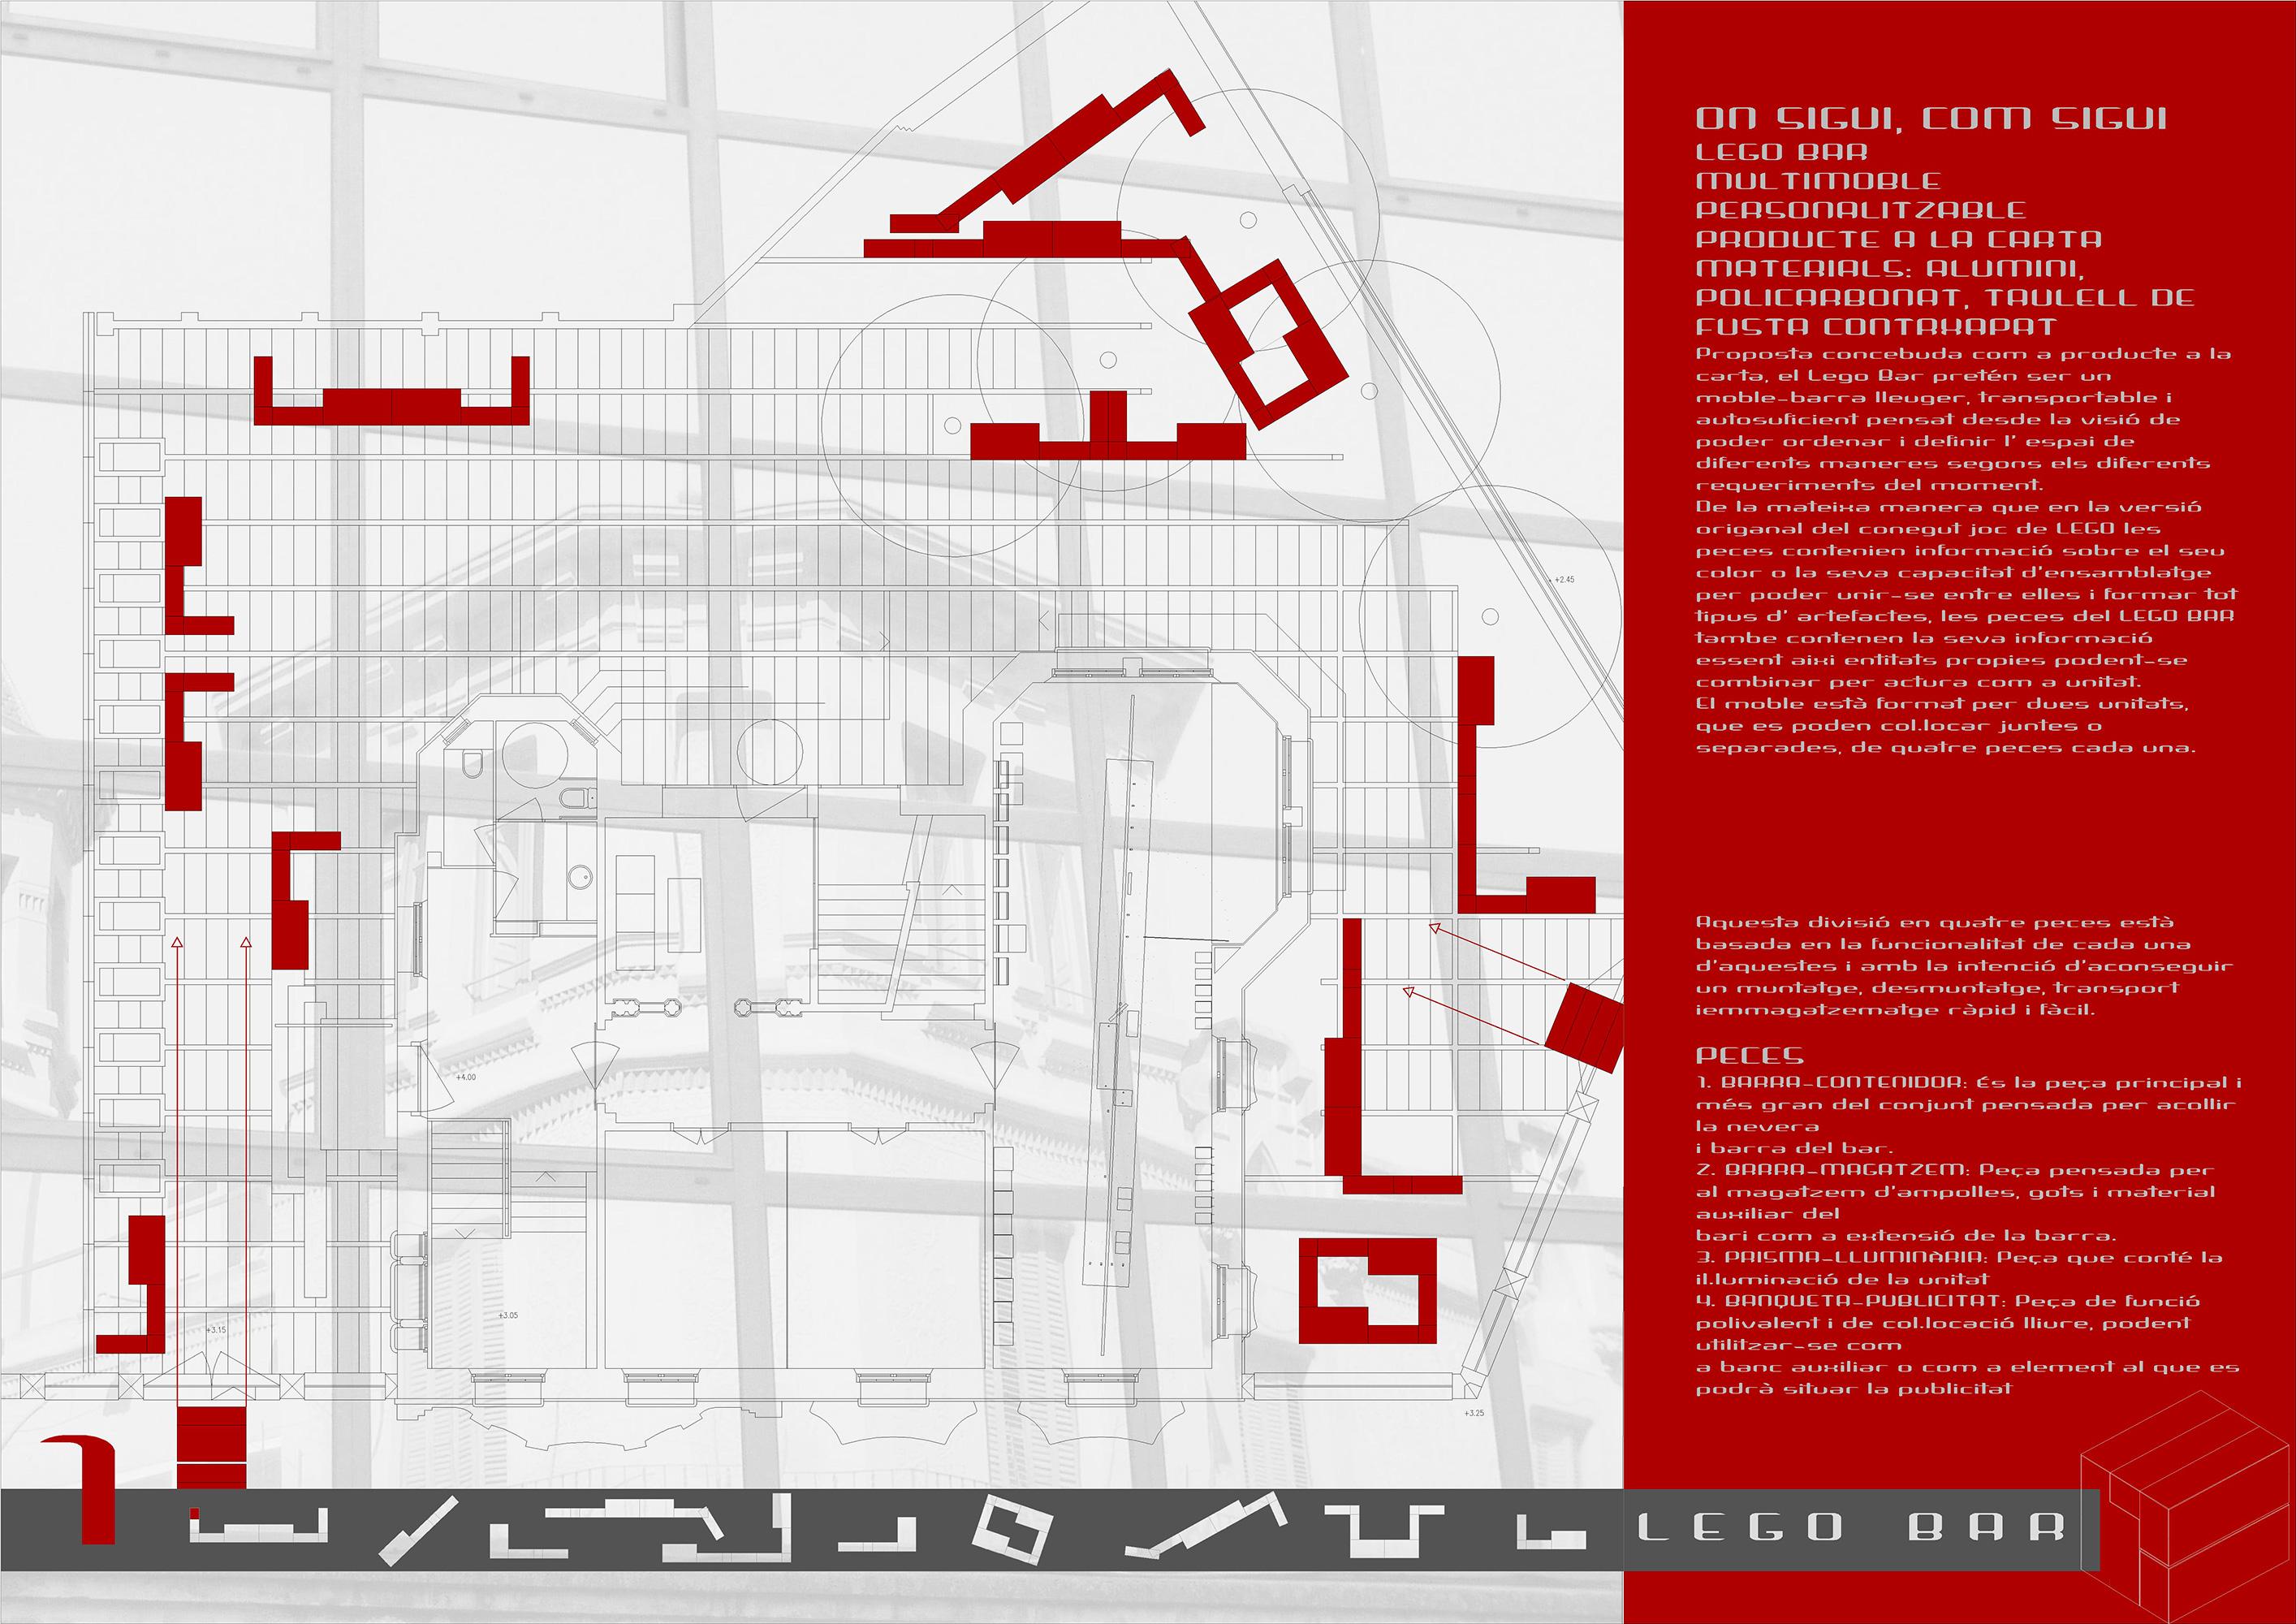 http://www.oa-arquitectes.com/wp-content/uploads/2018/05/01-1.jpg